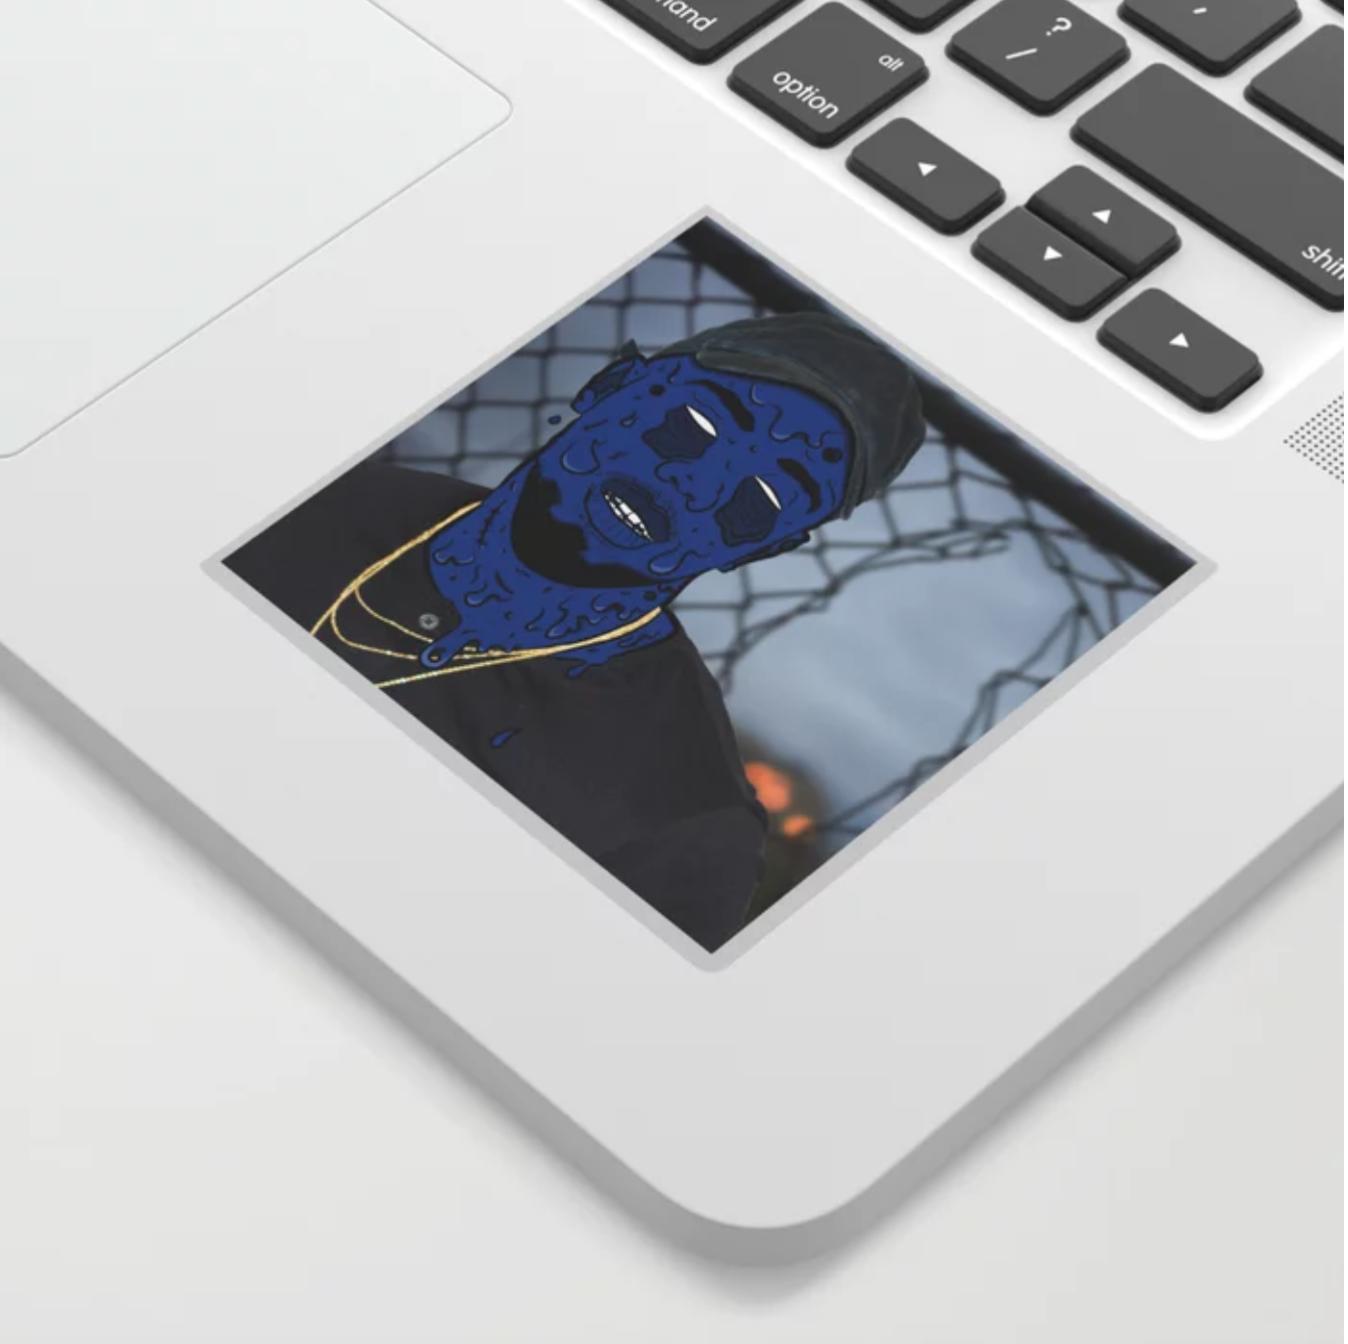 $3.99    BUY    Blu Goo Sticker